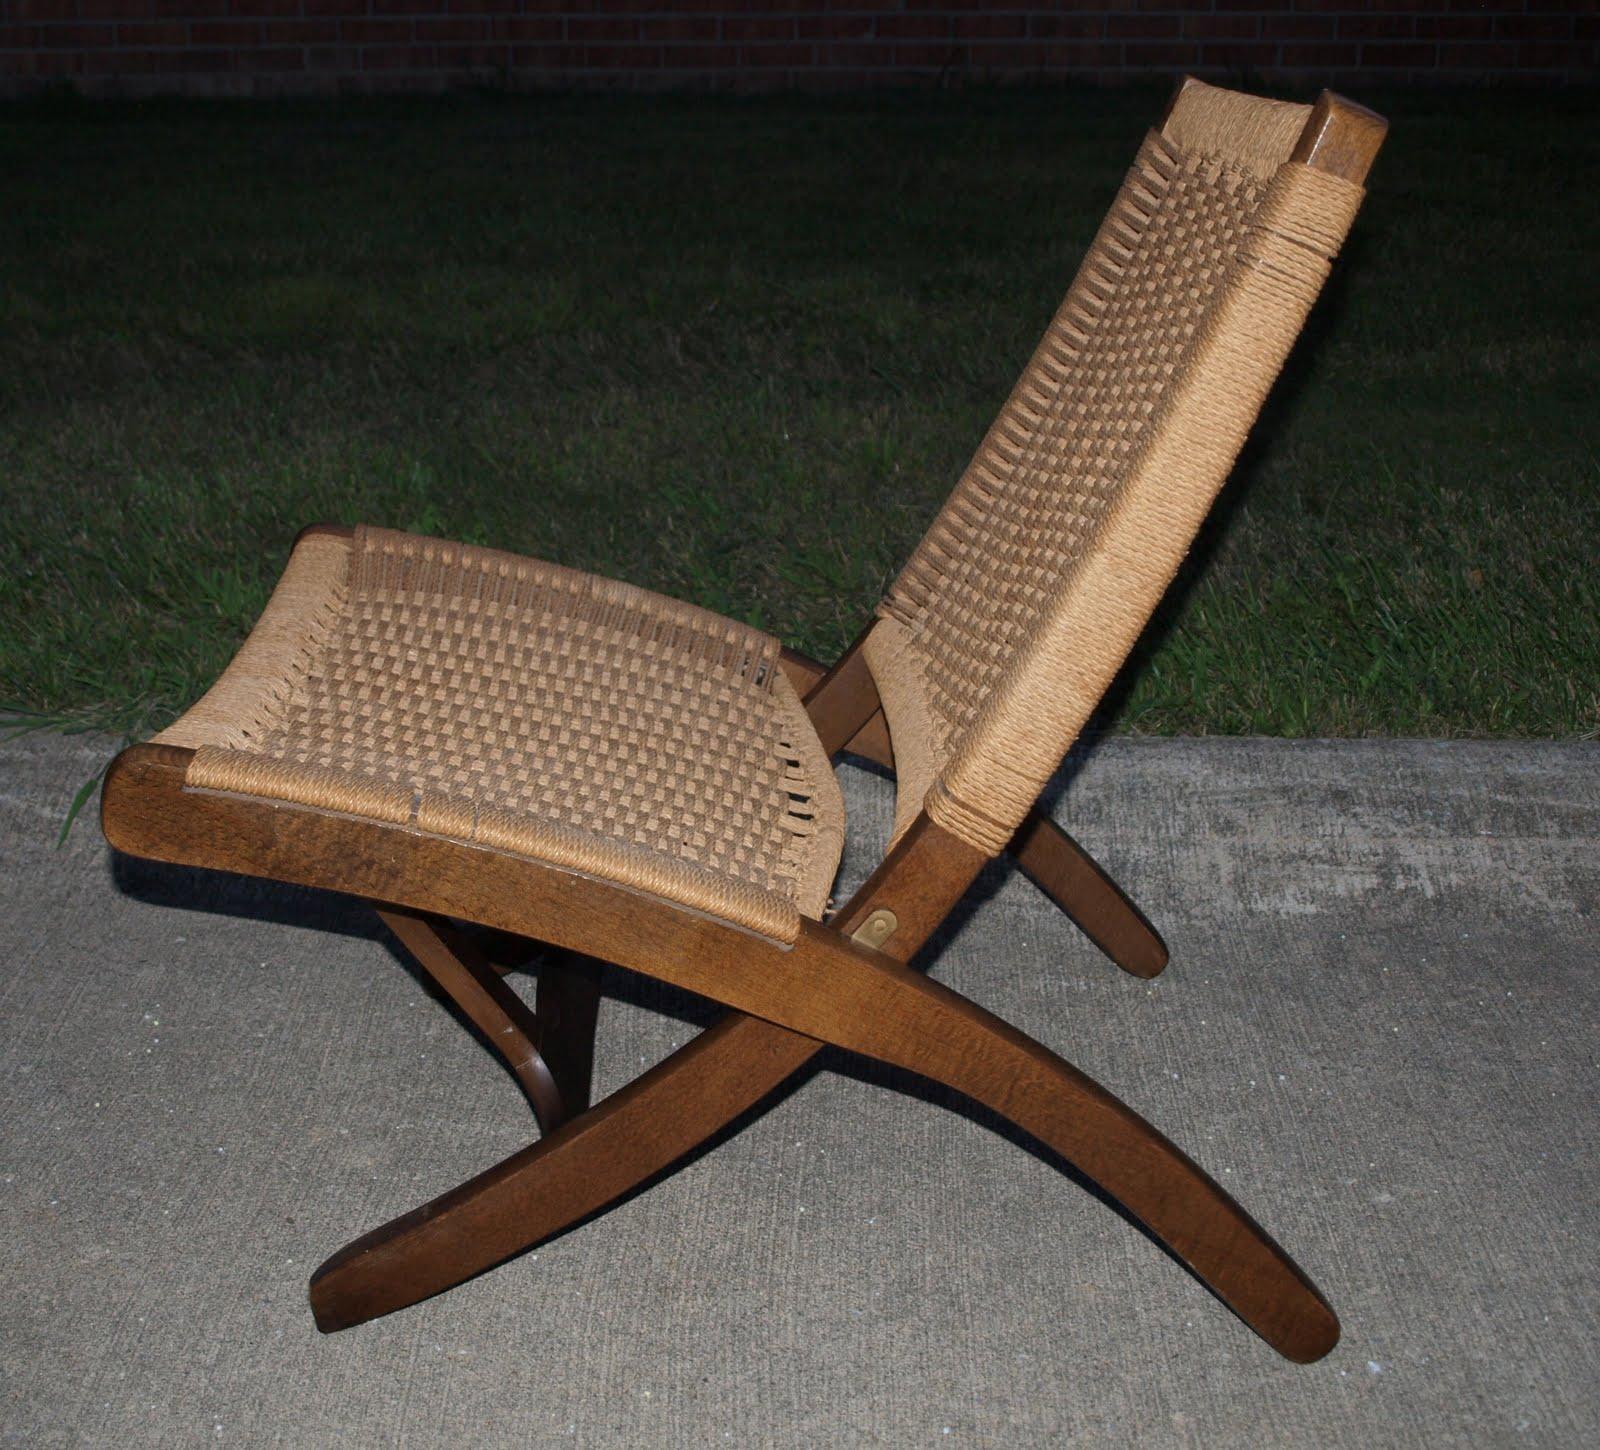 yugoslavian folding chair small wicker funky home finds for sale wegner style danish modern